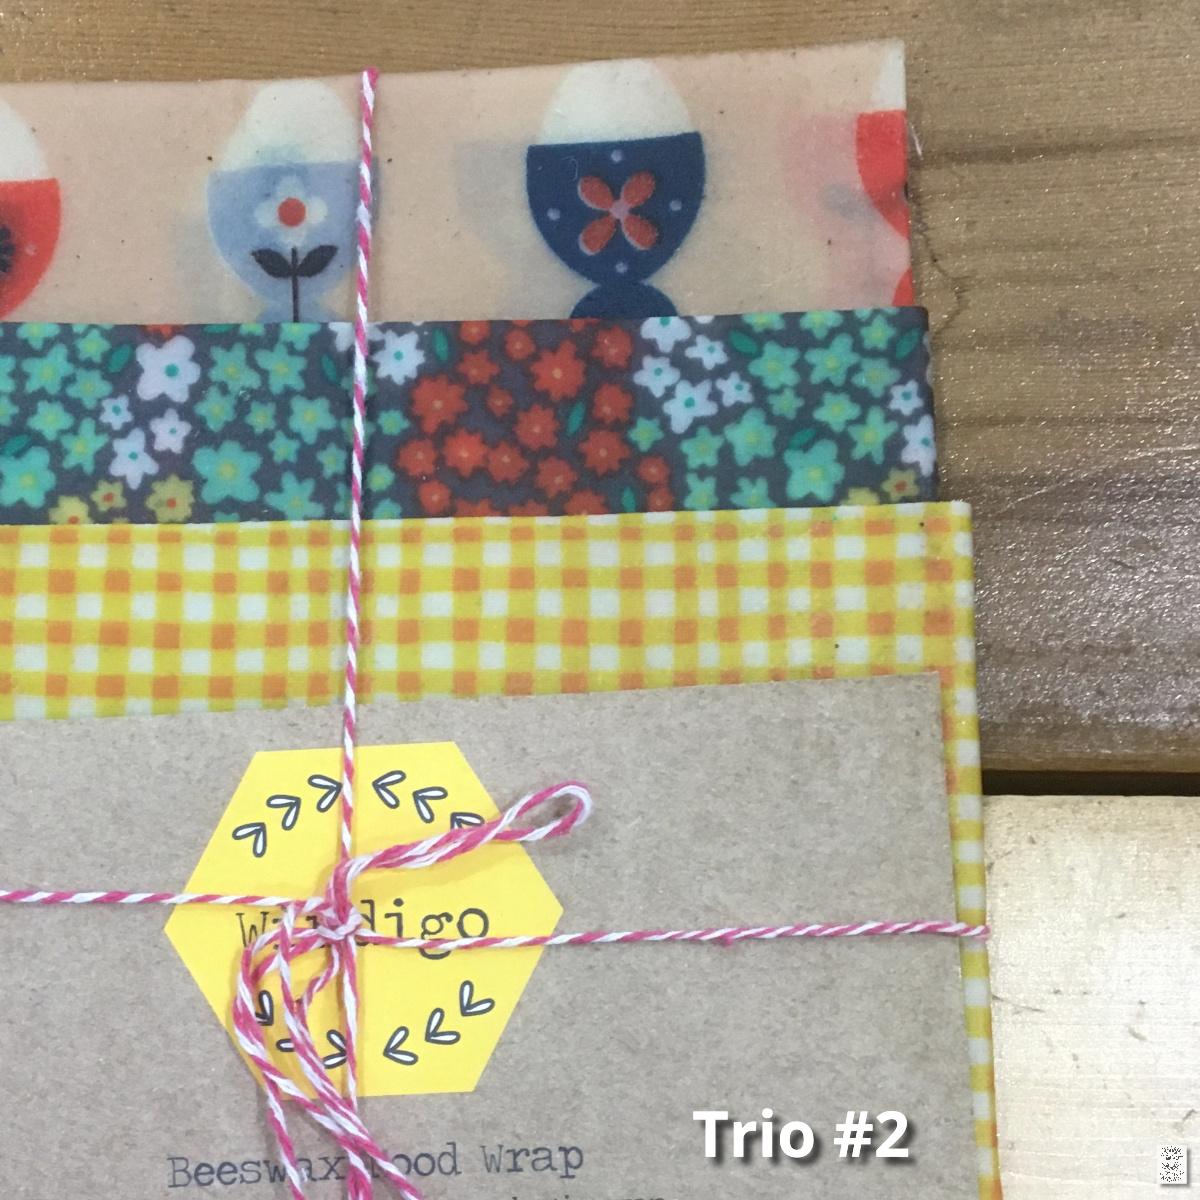 Windigo Beeswax Food Wrap Trio